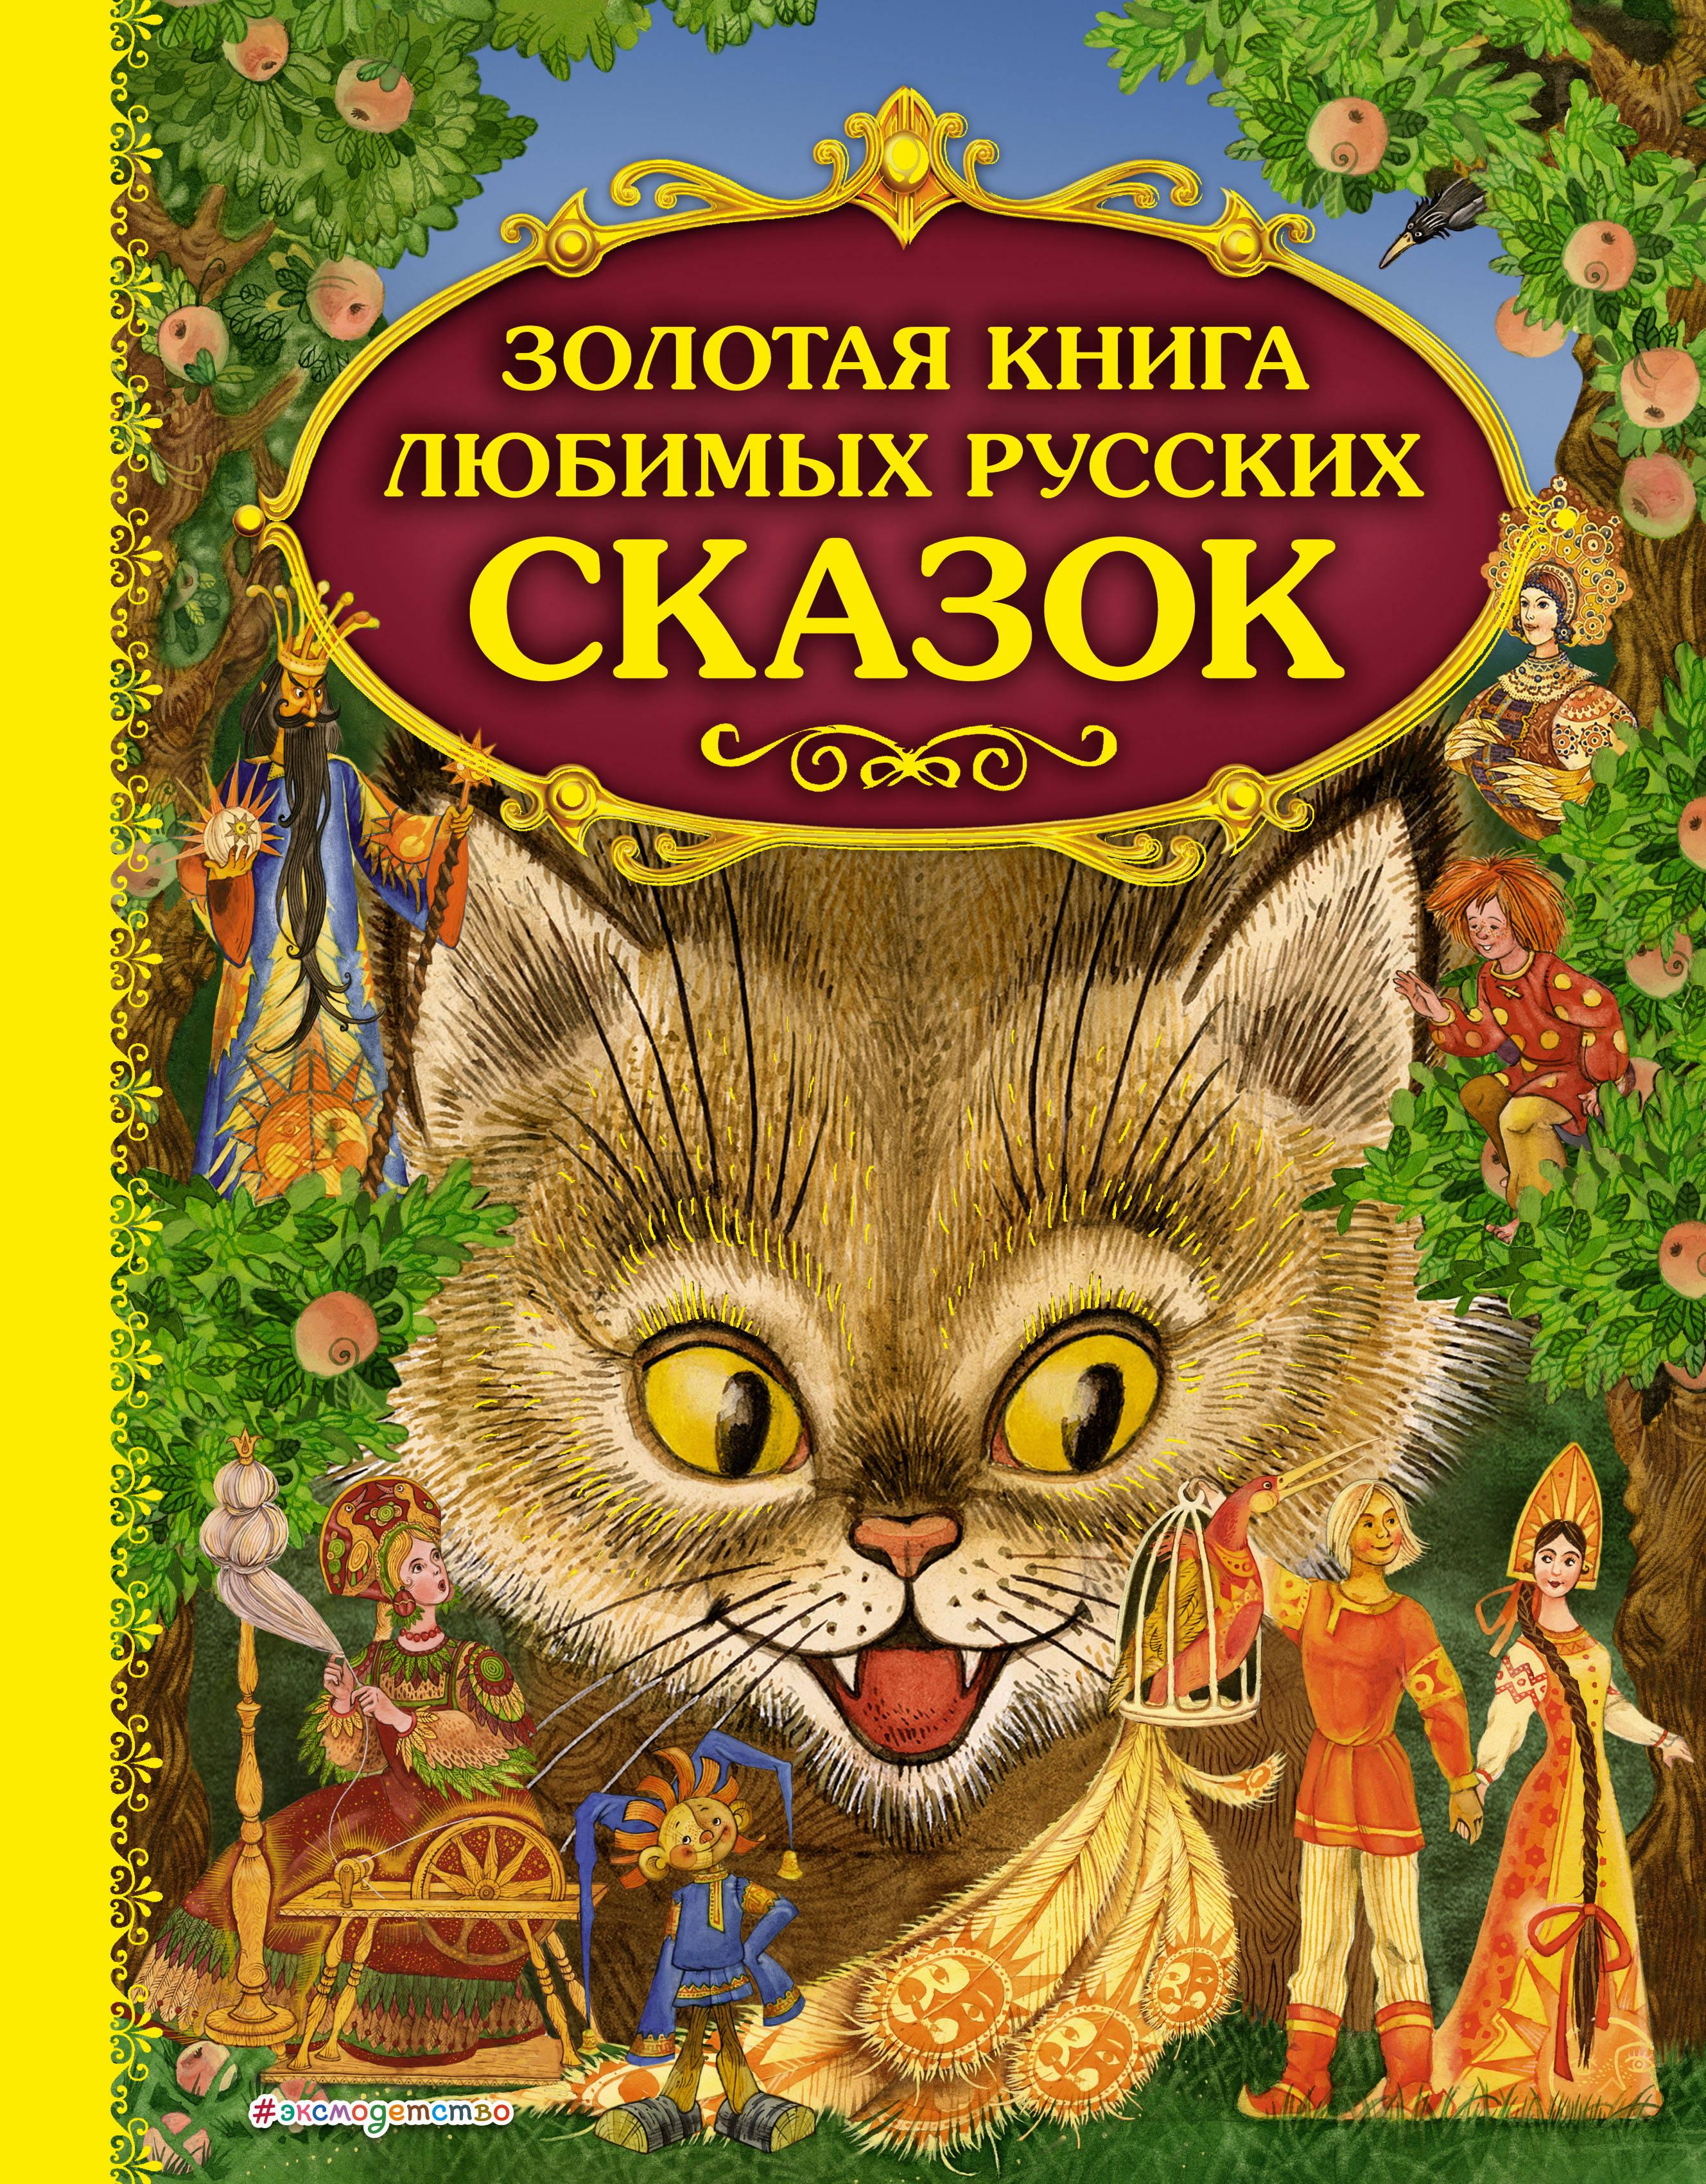 Обложки русских книг картинки